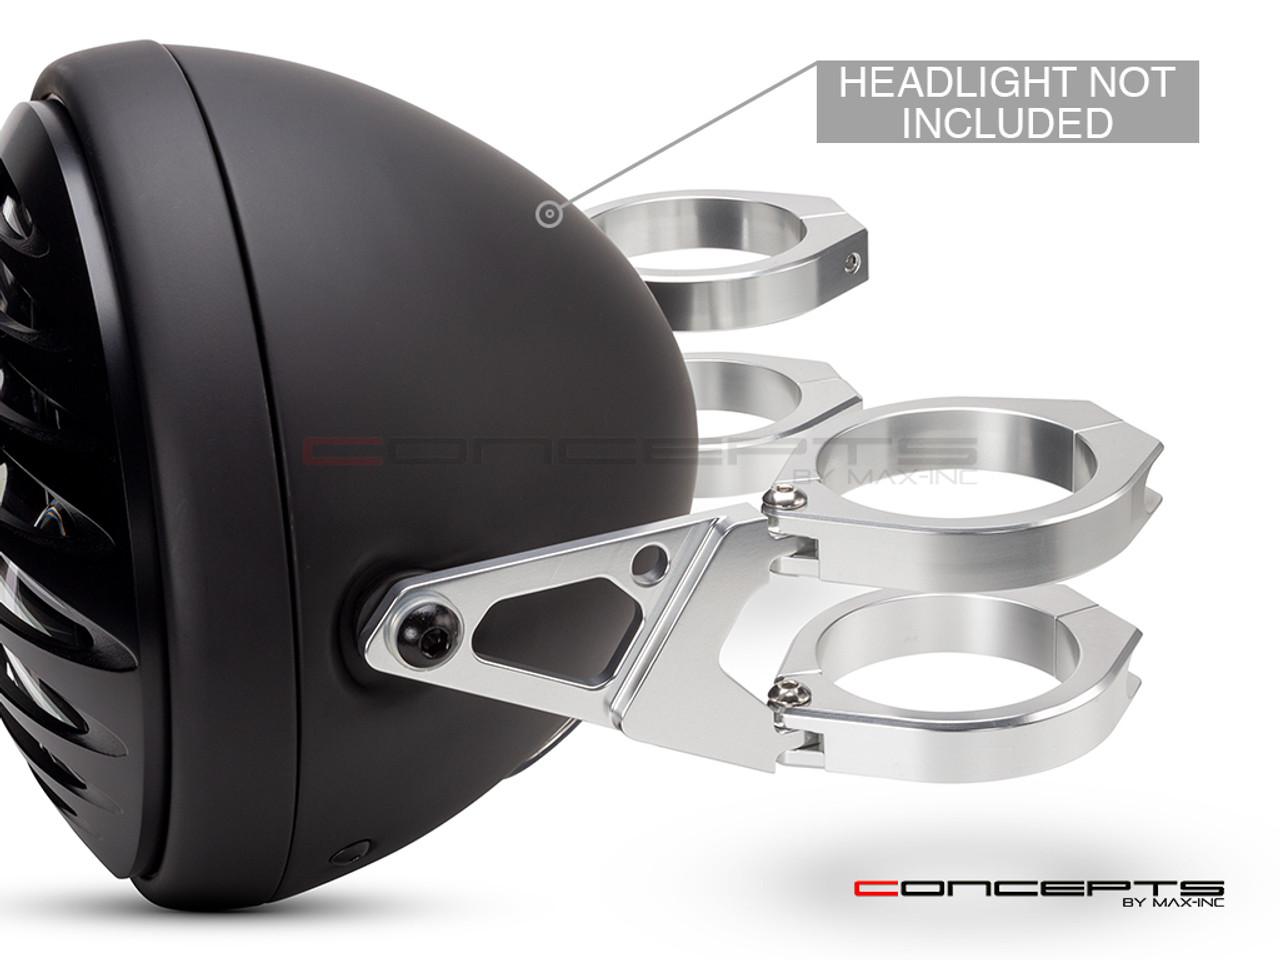 MAX Blade Polished CNC Machined Aluminum Headlight Brackets  - Fits Fork Sizes 32 - 59mm